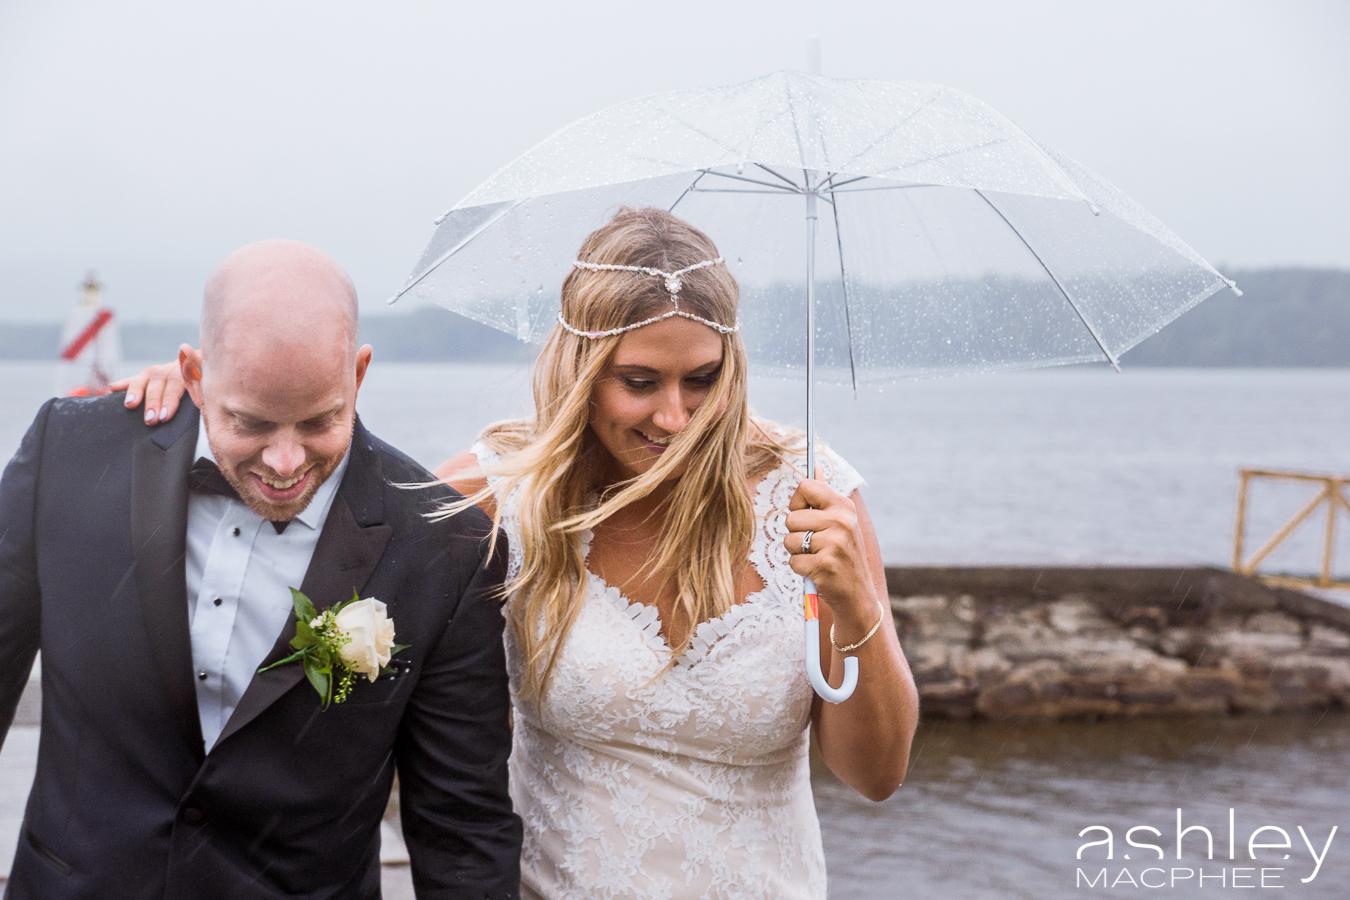 Ashley MacPhee Photography Hudson Yacht Club wedding photographer (75 of 112).jpg